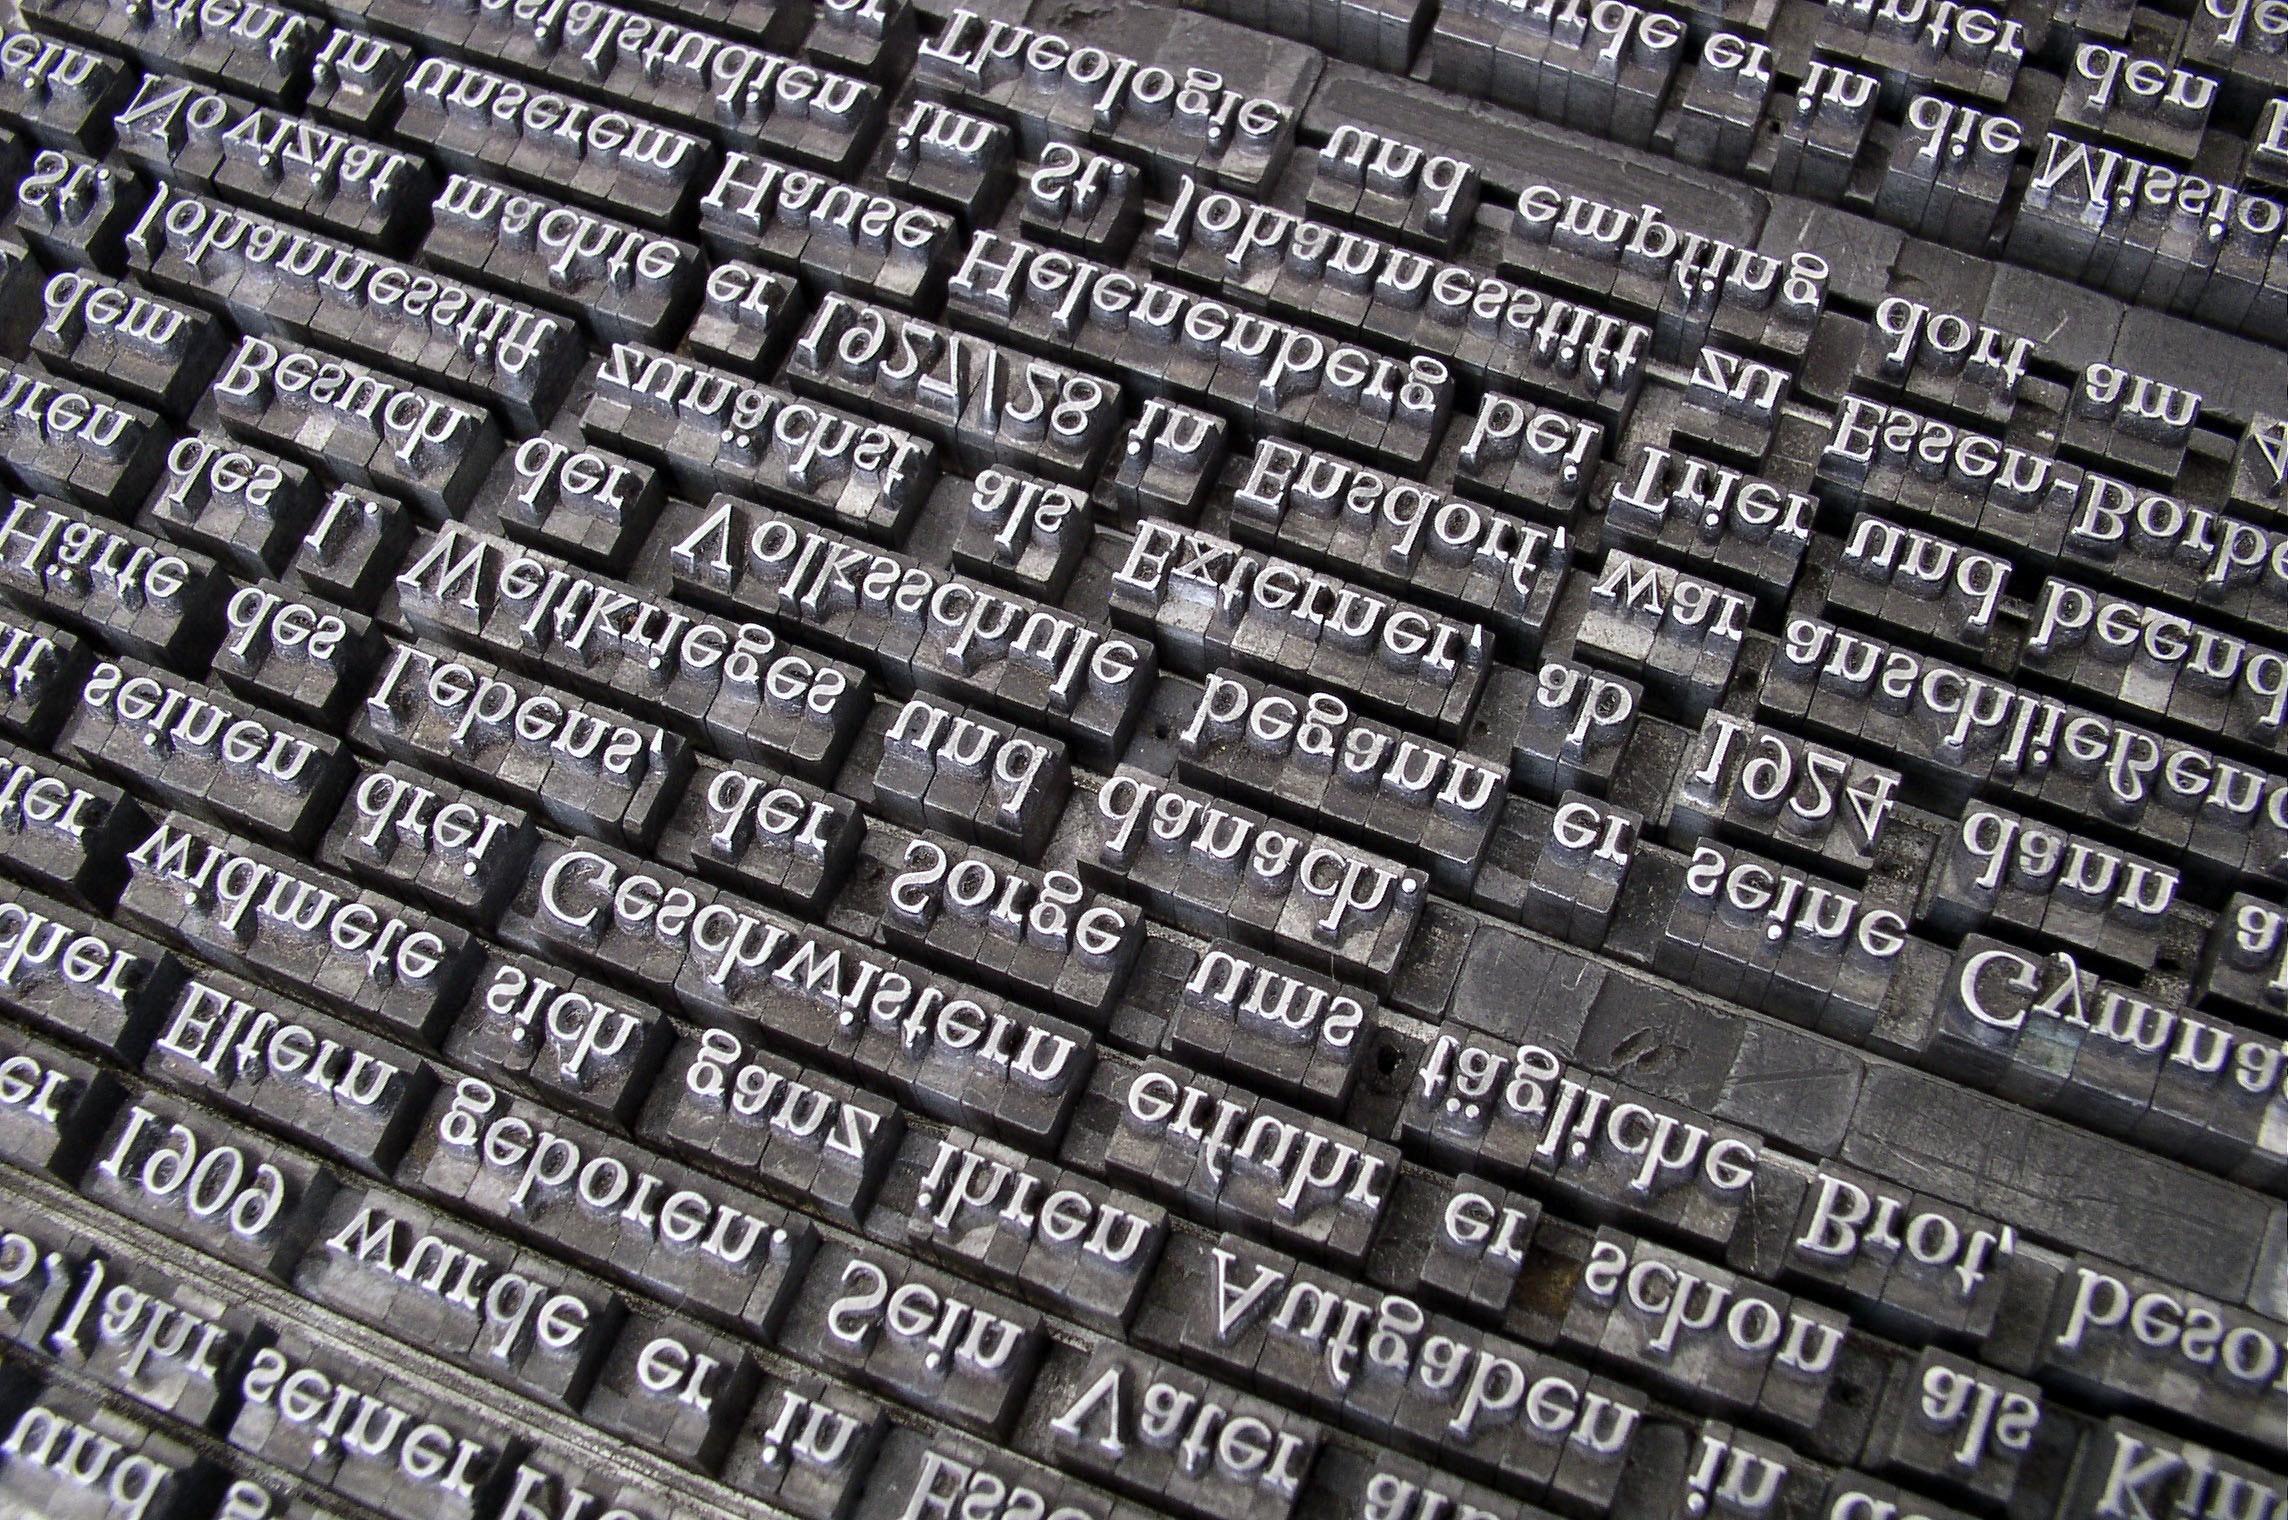 WordPress' Gutenberg: The Long View